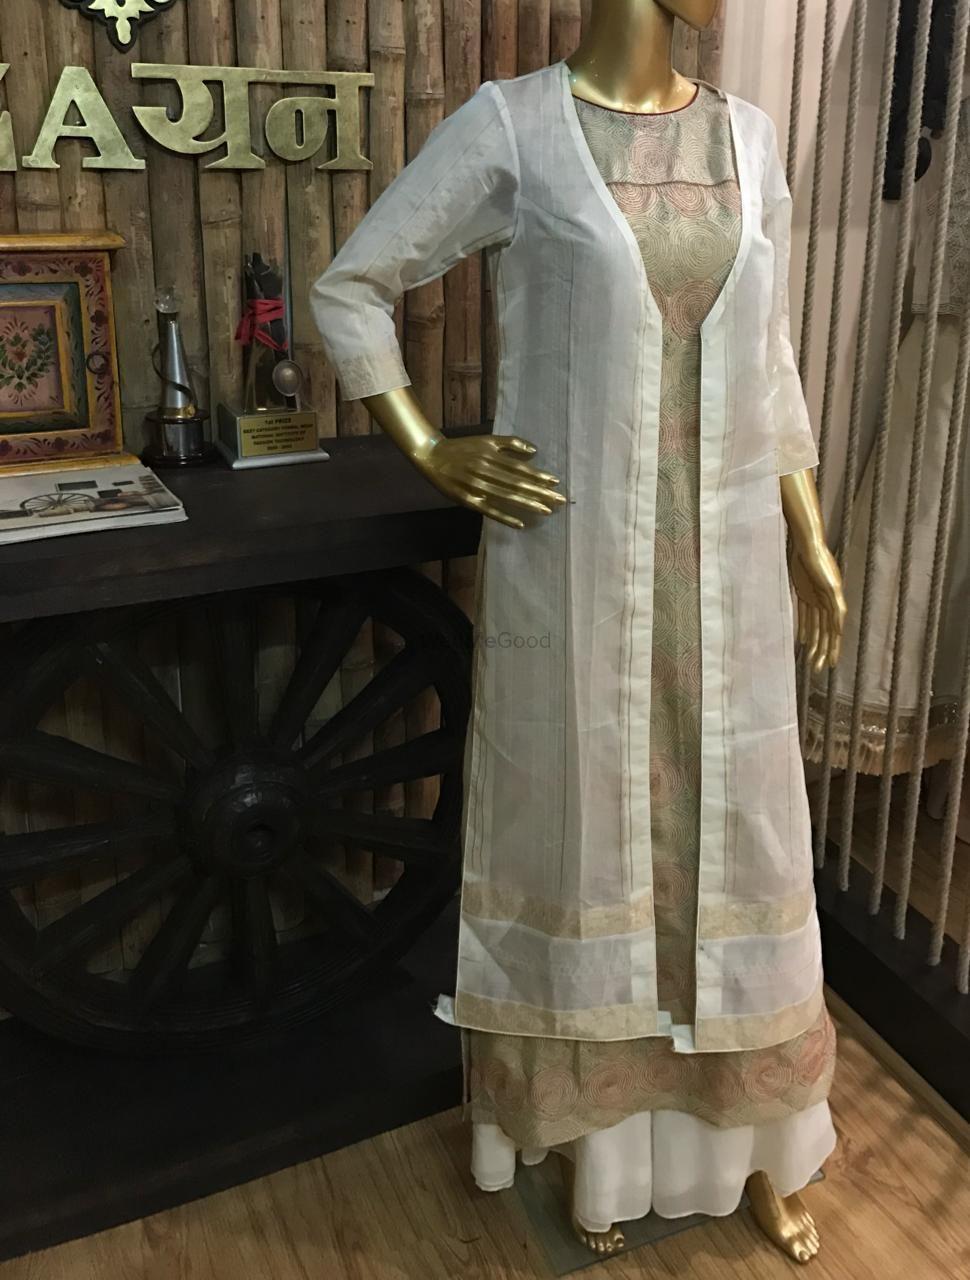 Photo From Ready to wear 2 - By Zayn by Swati and Anurag Seth